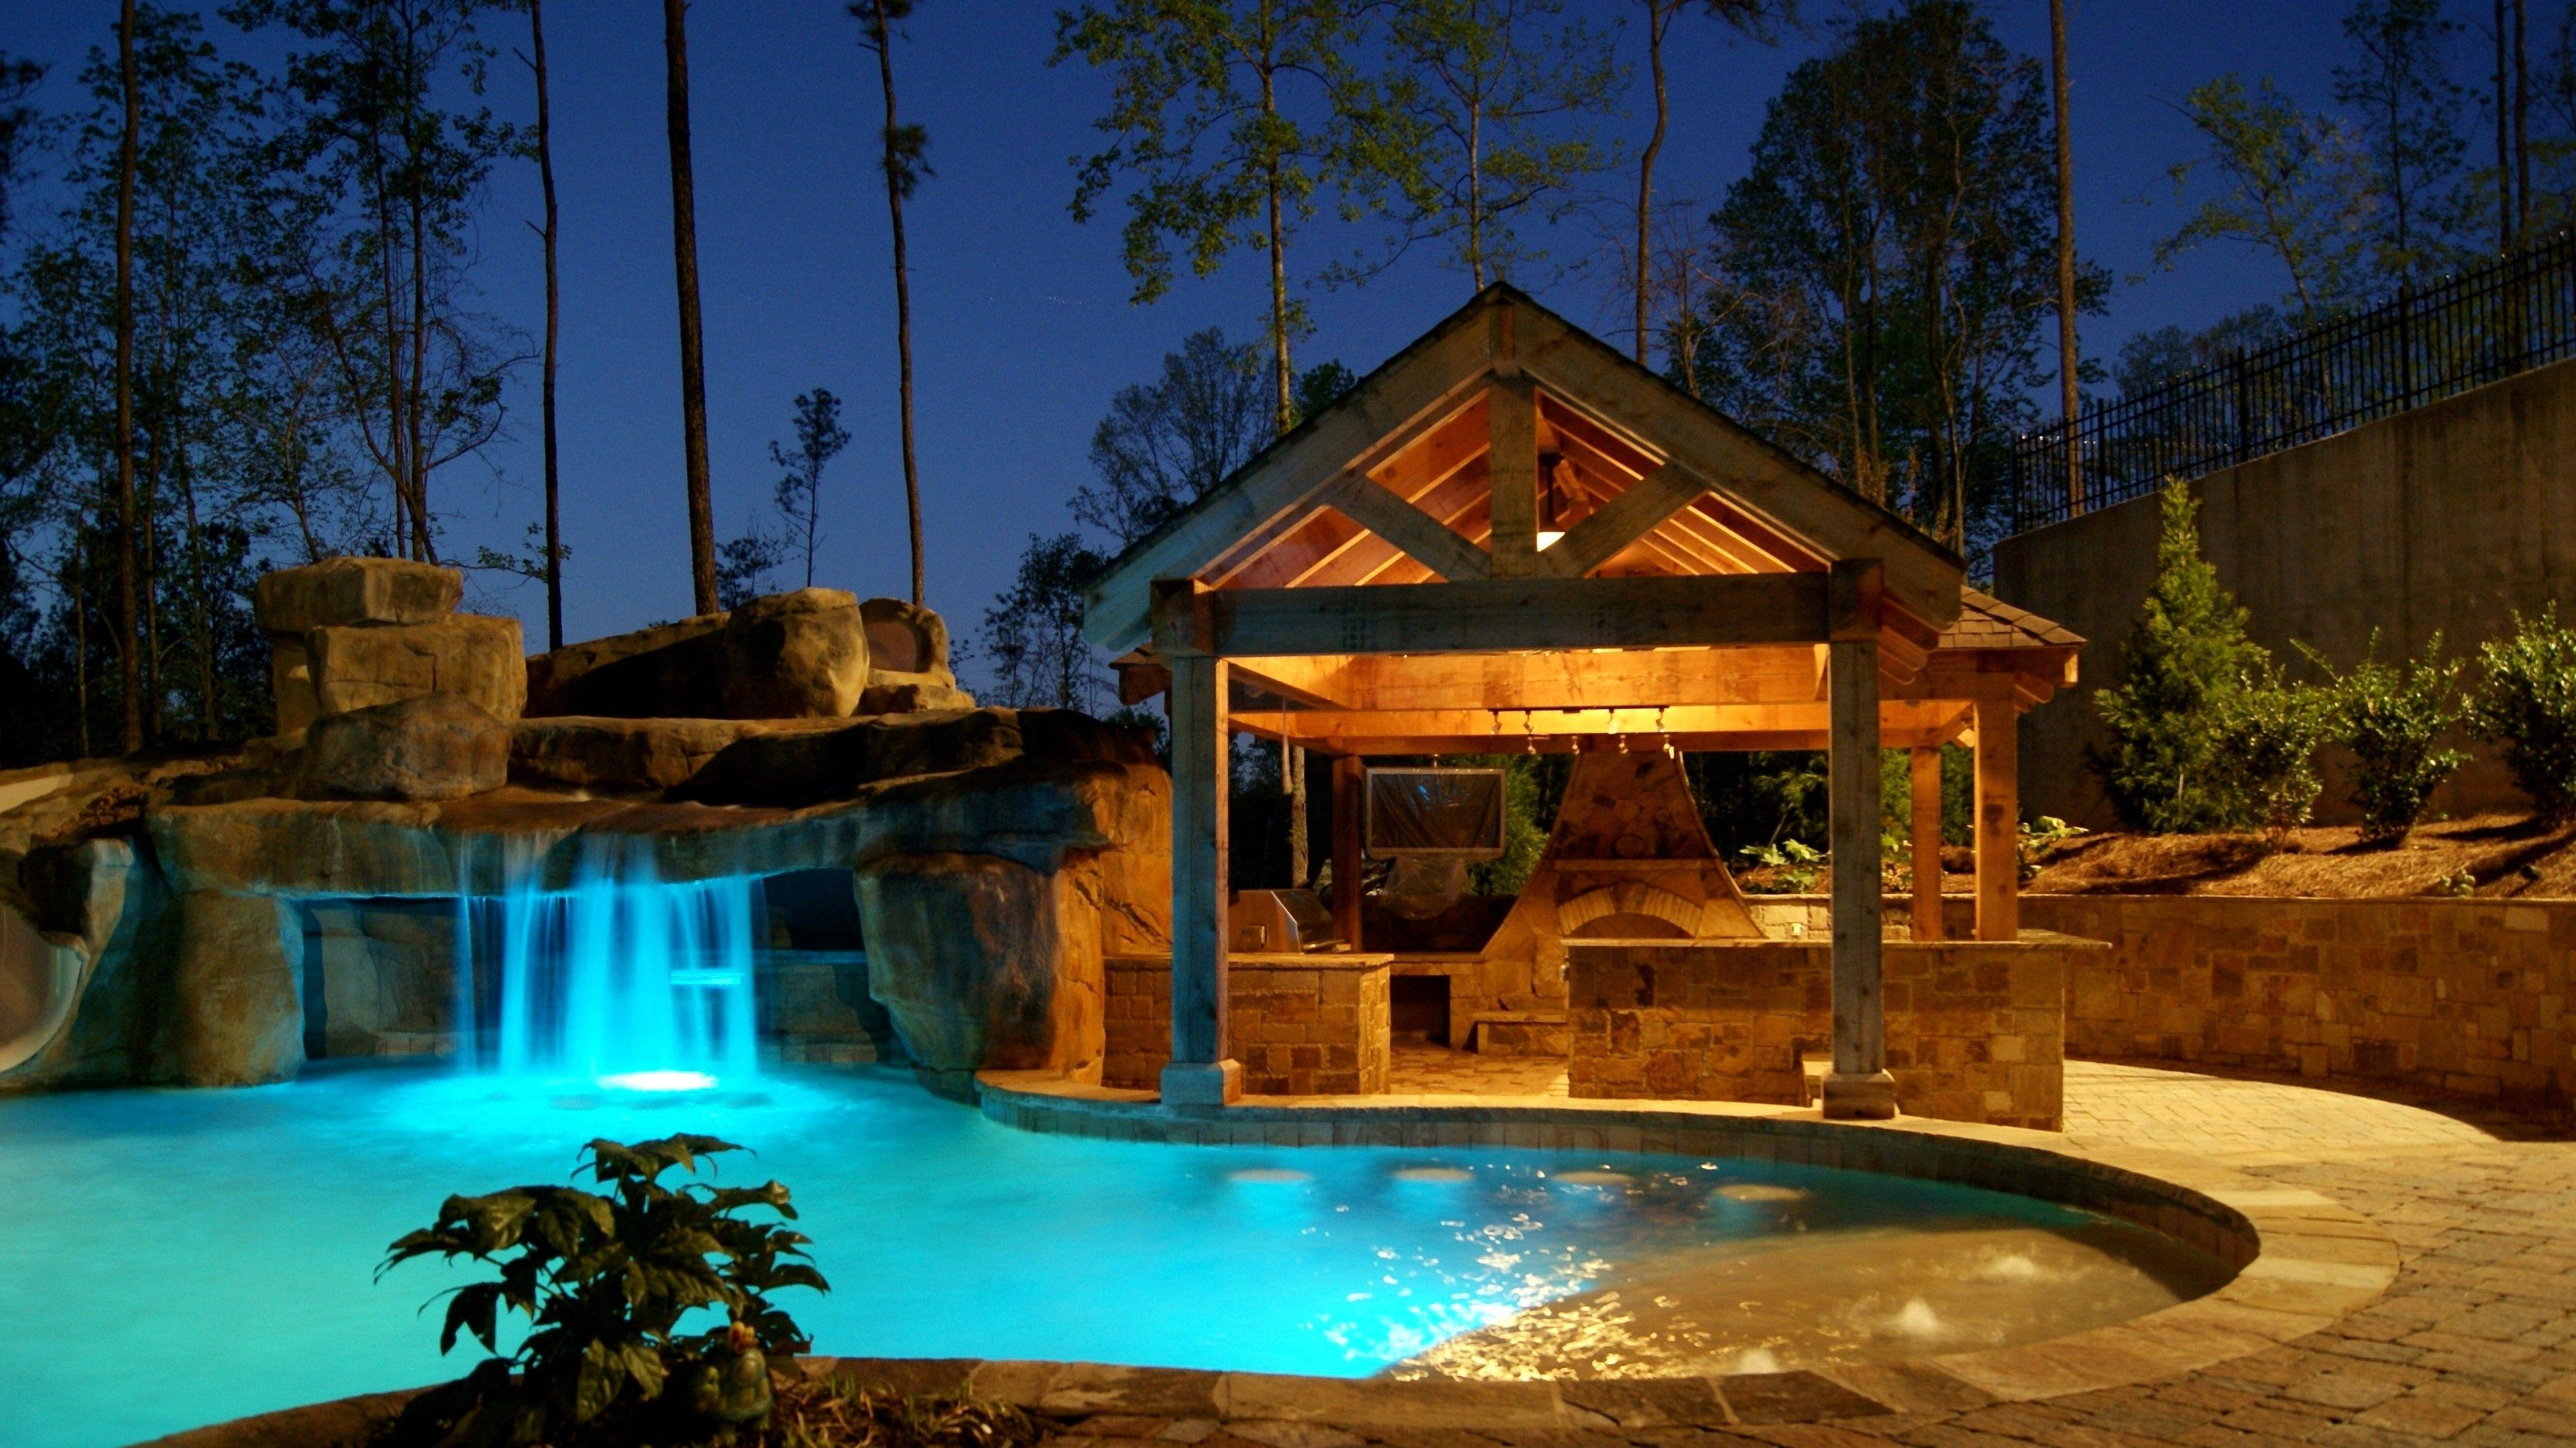 Georgia Dream Pools - Outdoor Living SpacesGeorgia Dream ... on Dream Backyard With Pool id=38874